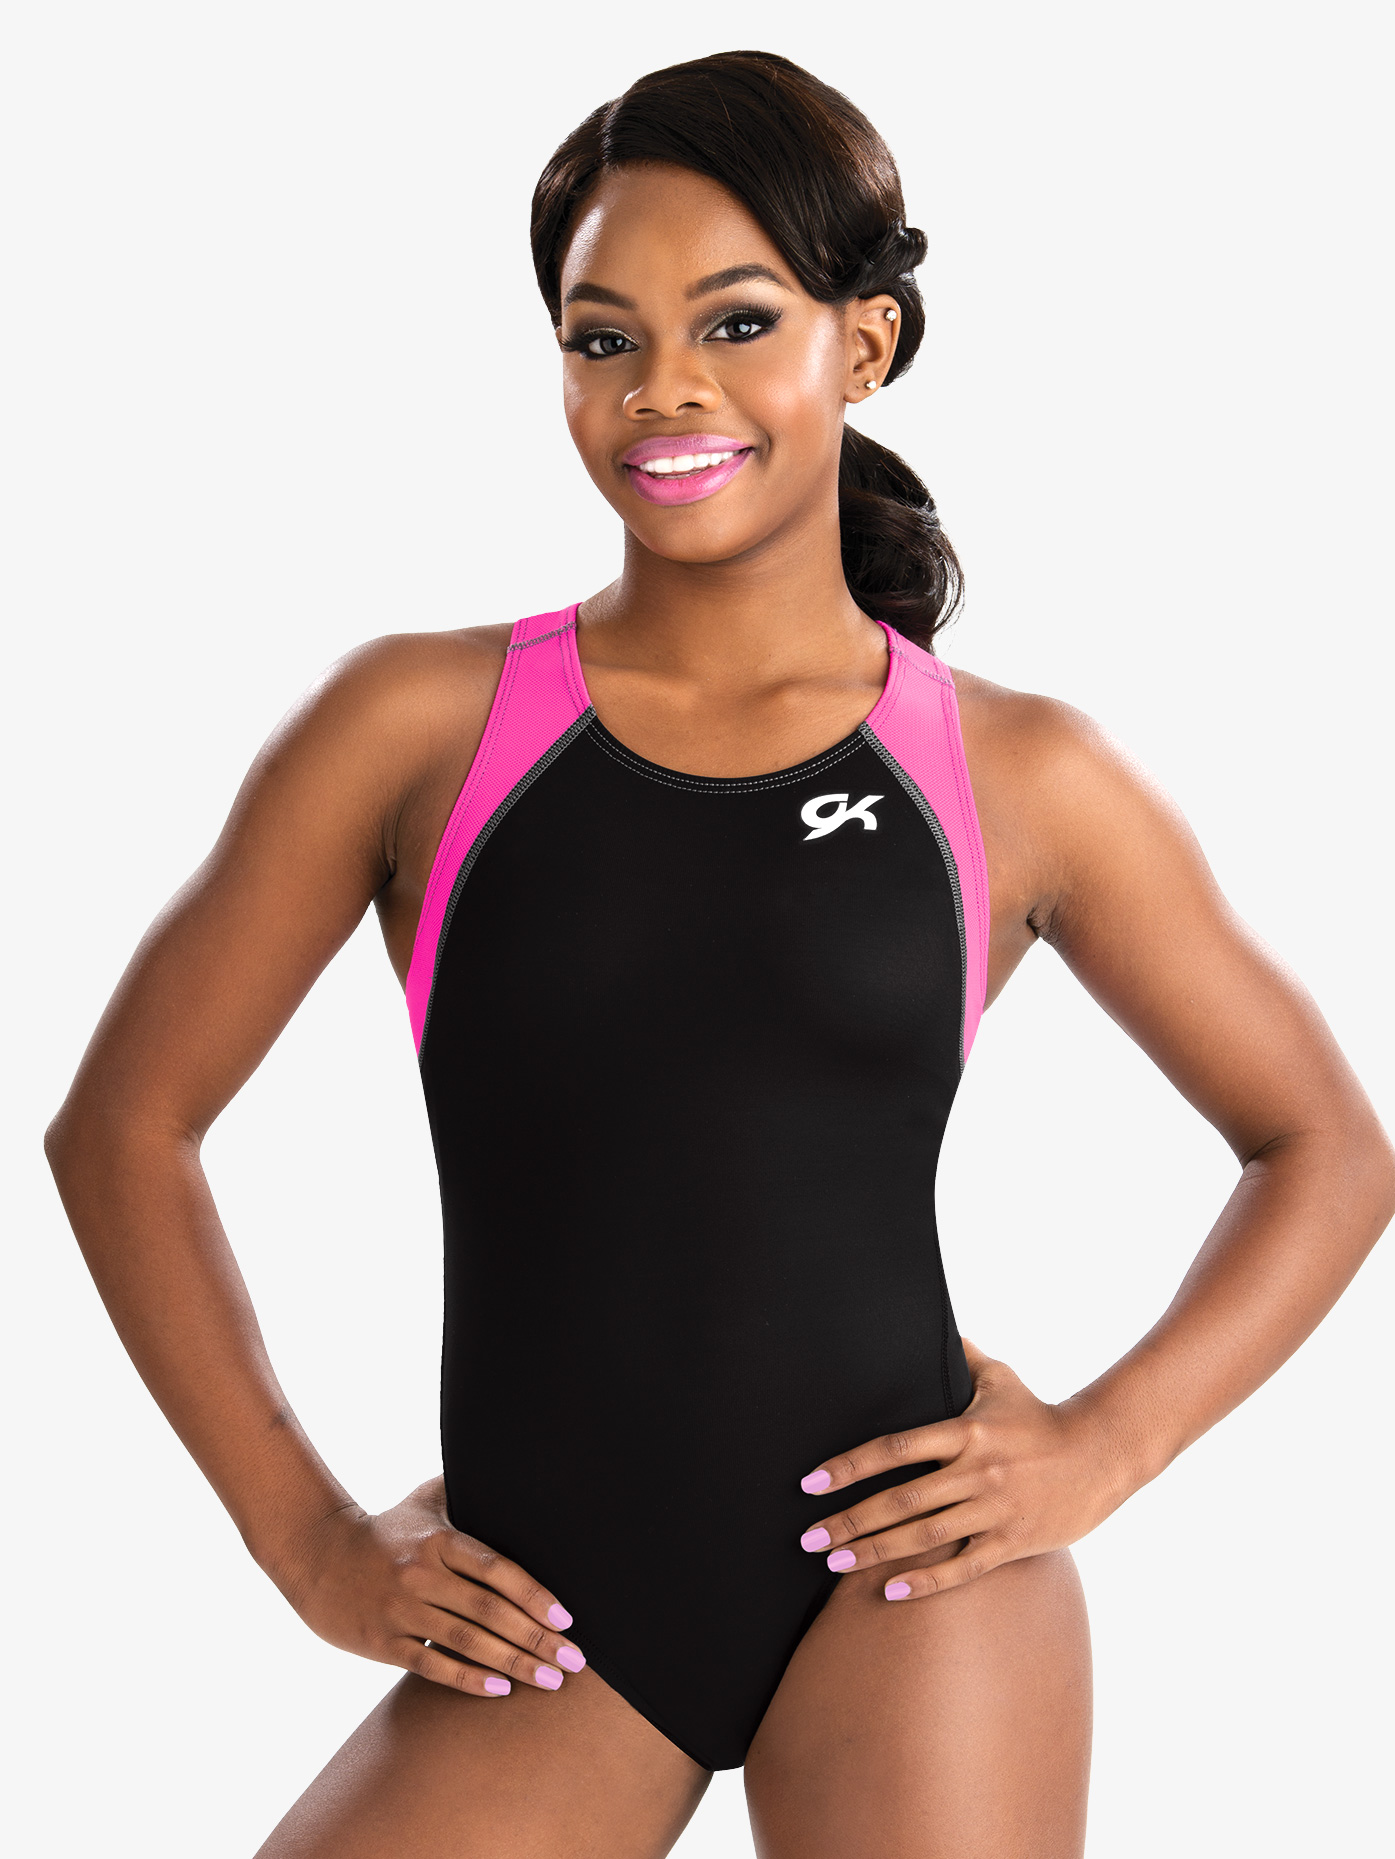 E3705 Sapphire Freeze GK Elite Sportswear Gymnastics